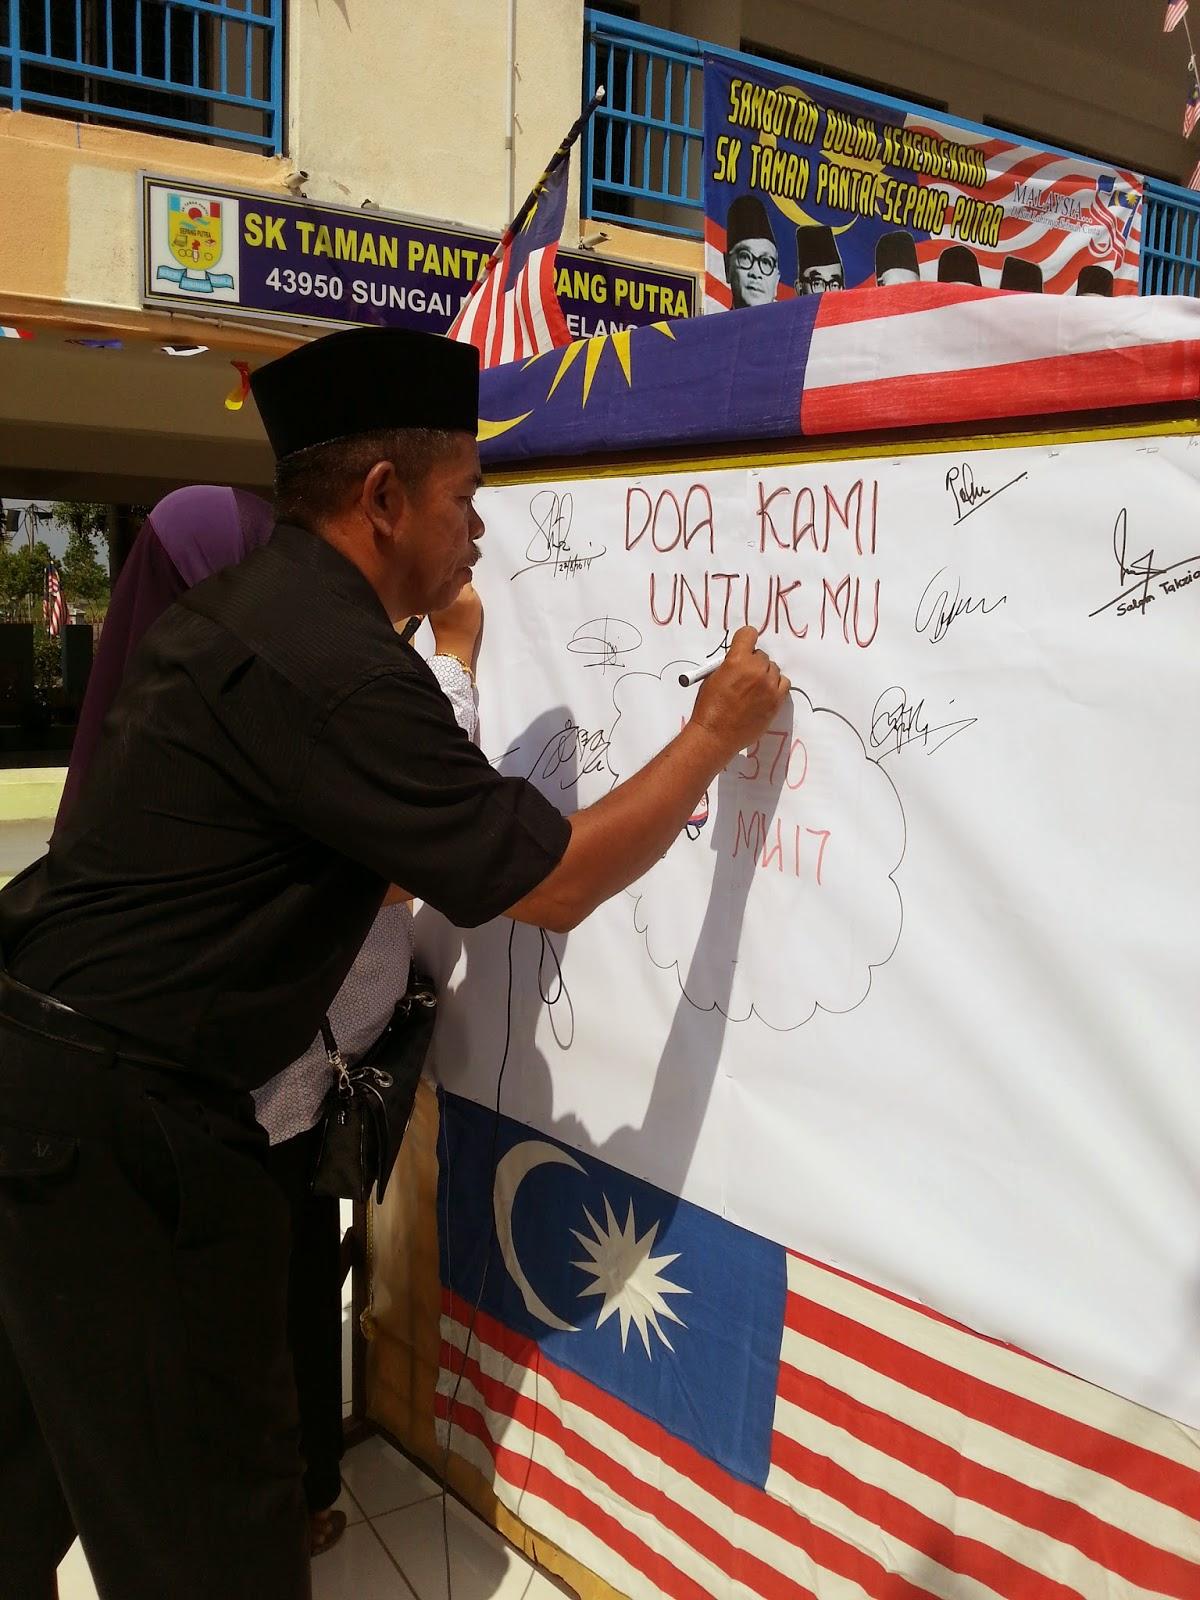 Hari PerKabungan Negara MH 17 22 Ogos 2014